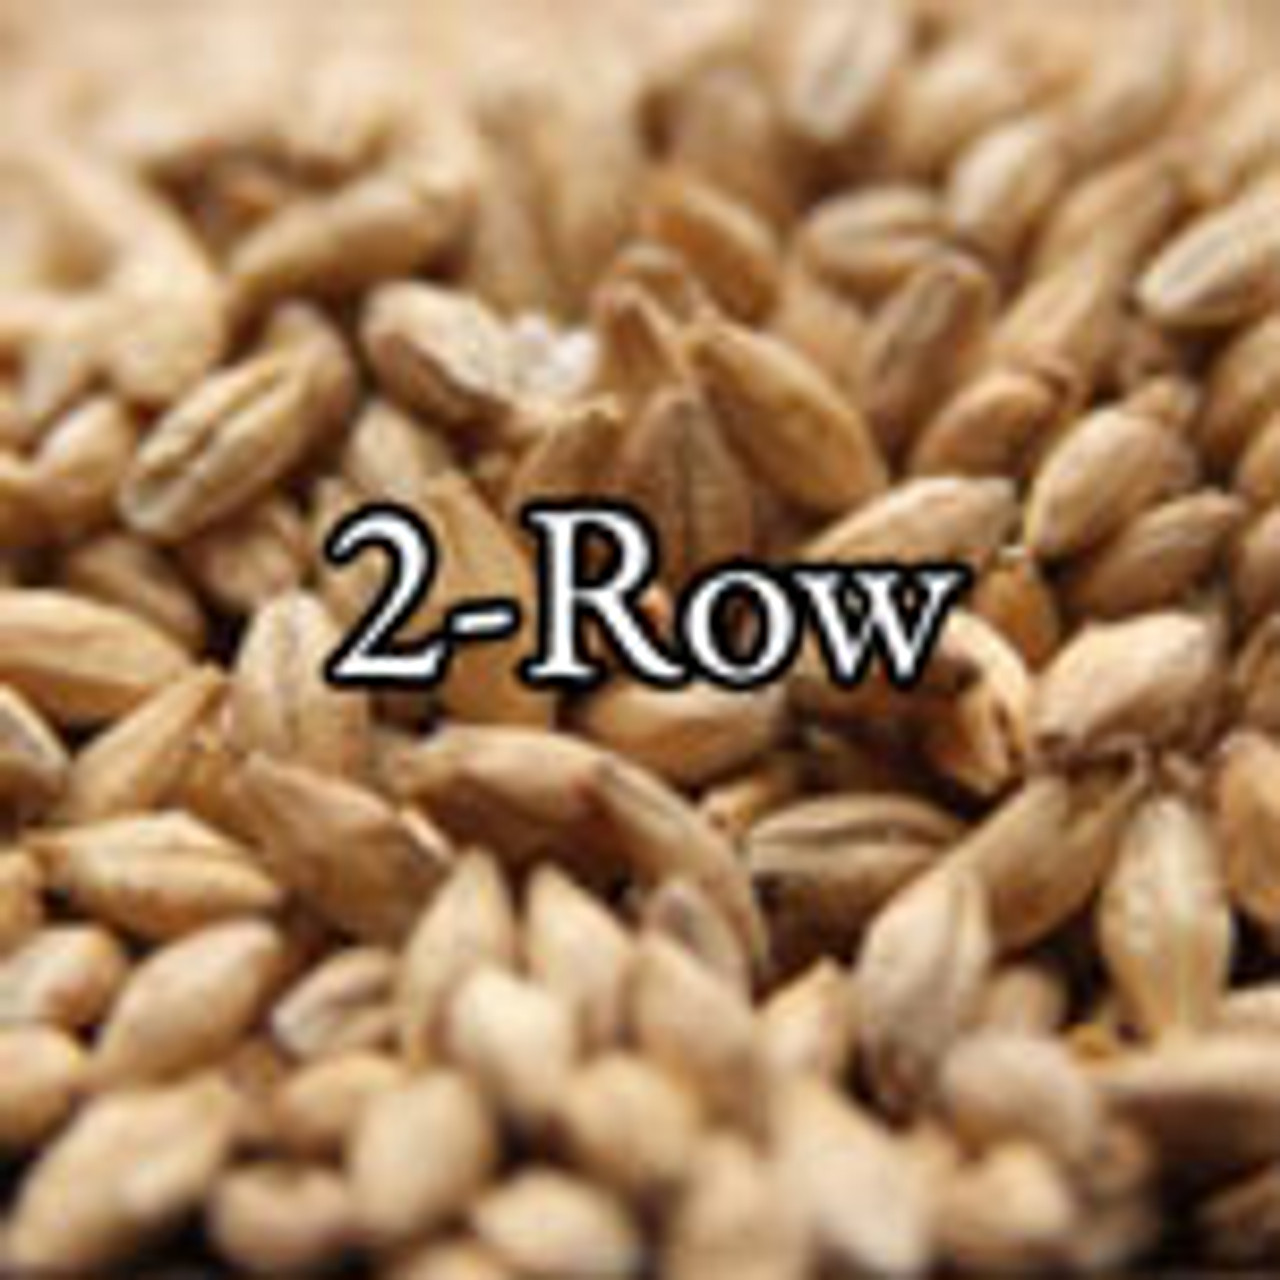 2 Row Malt - BREWinternational